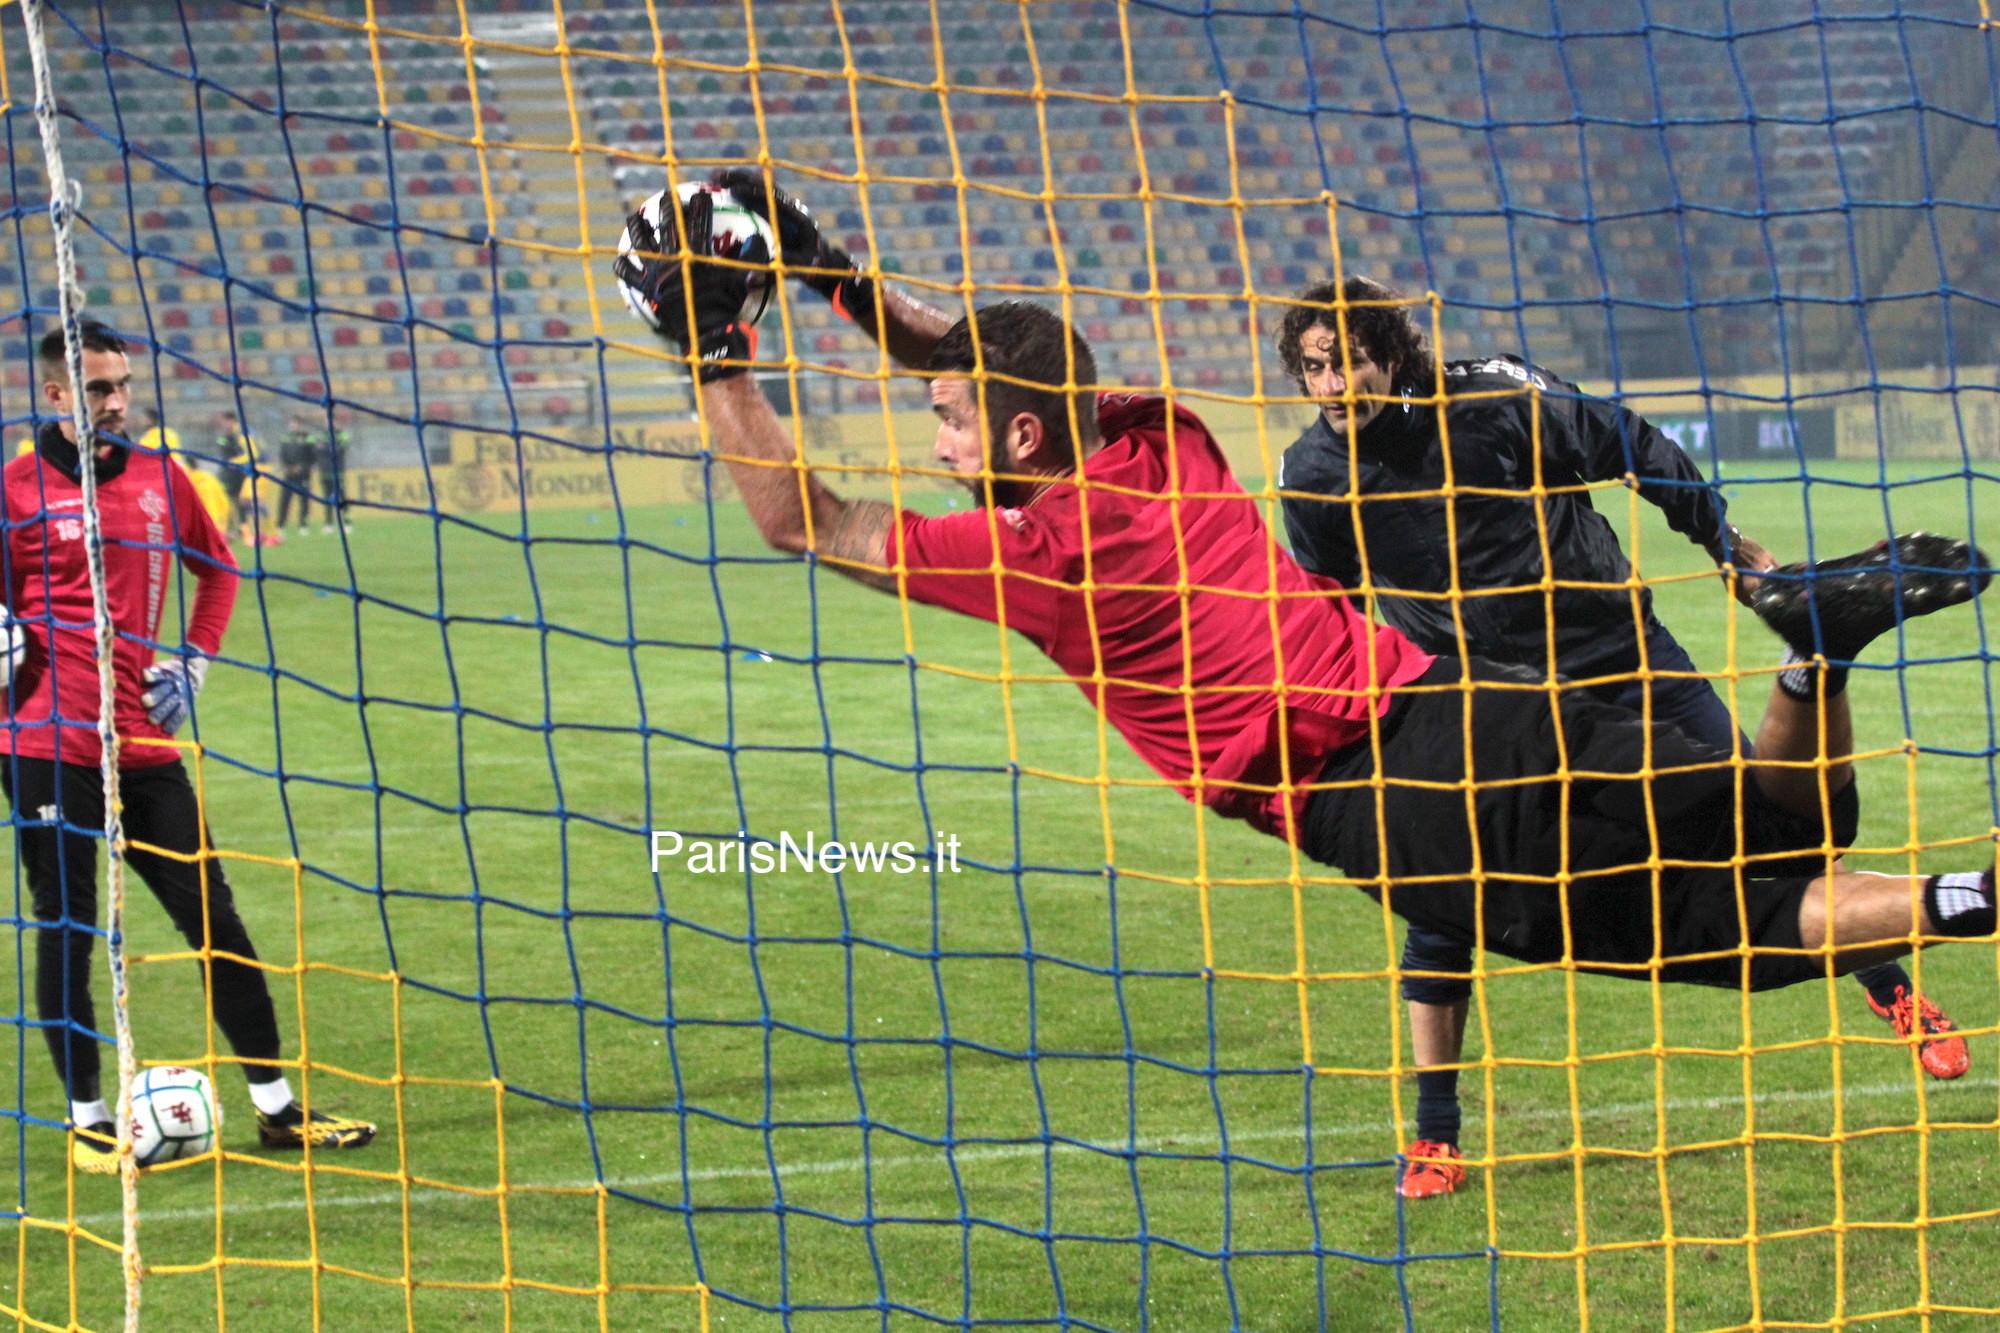 Frosinone - Cremonese 1-0 fin